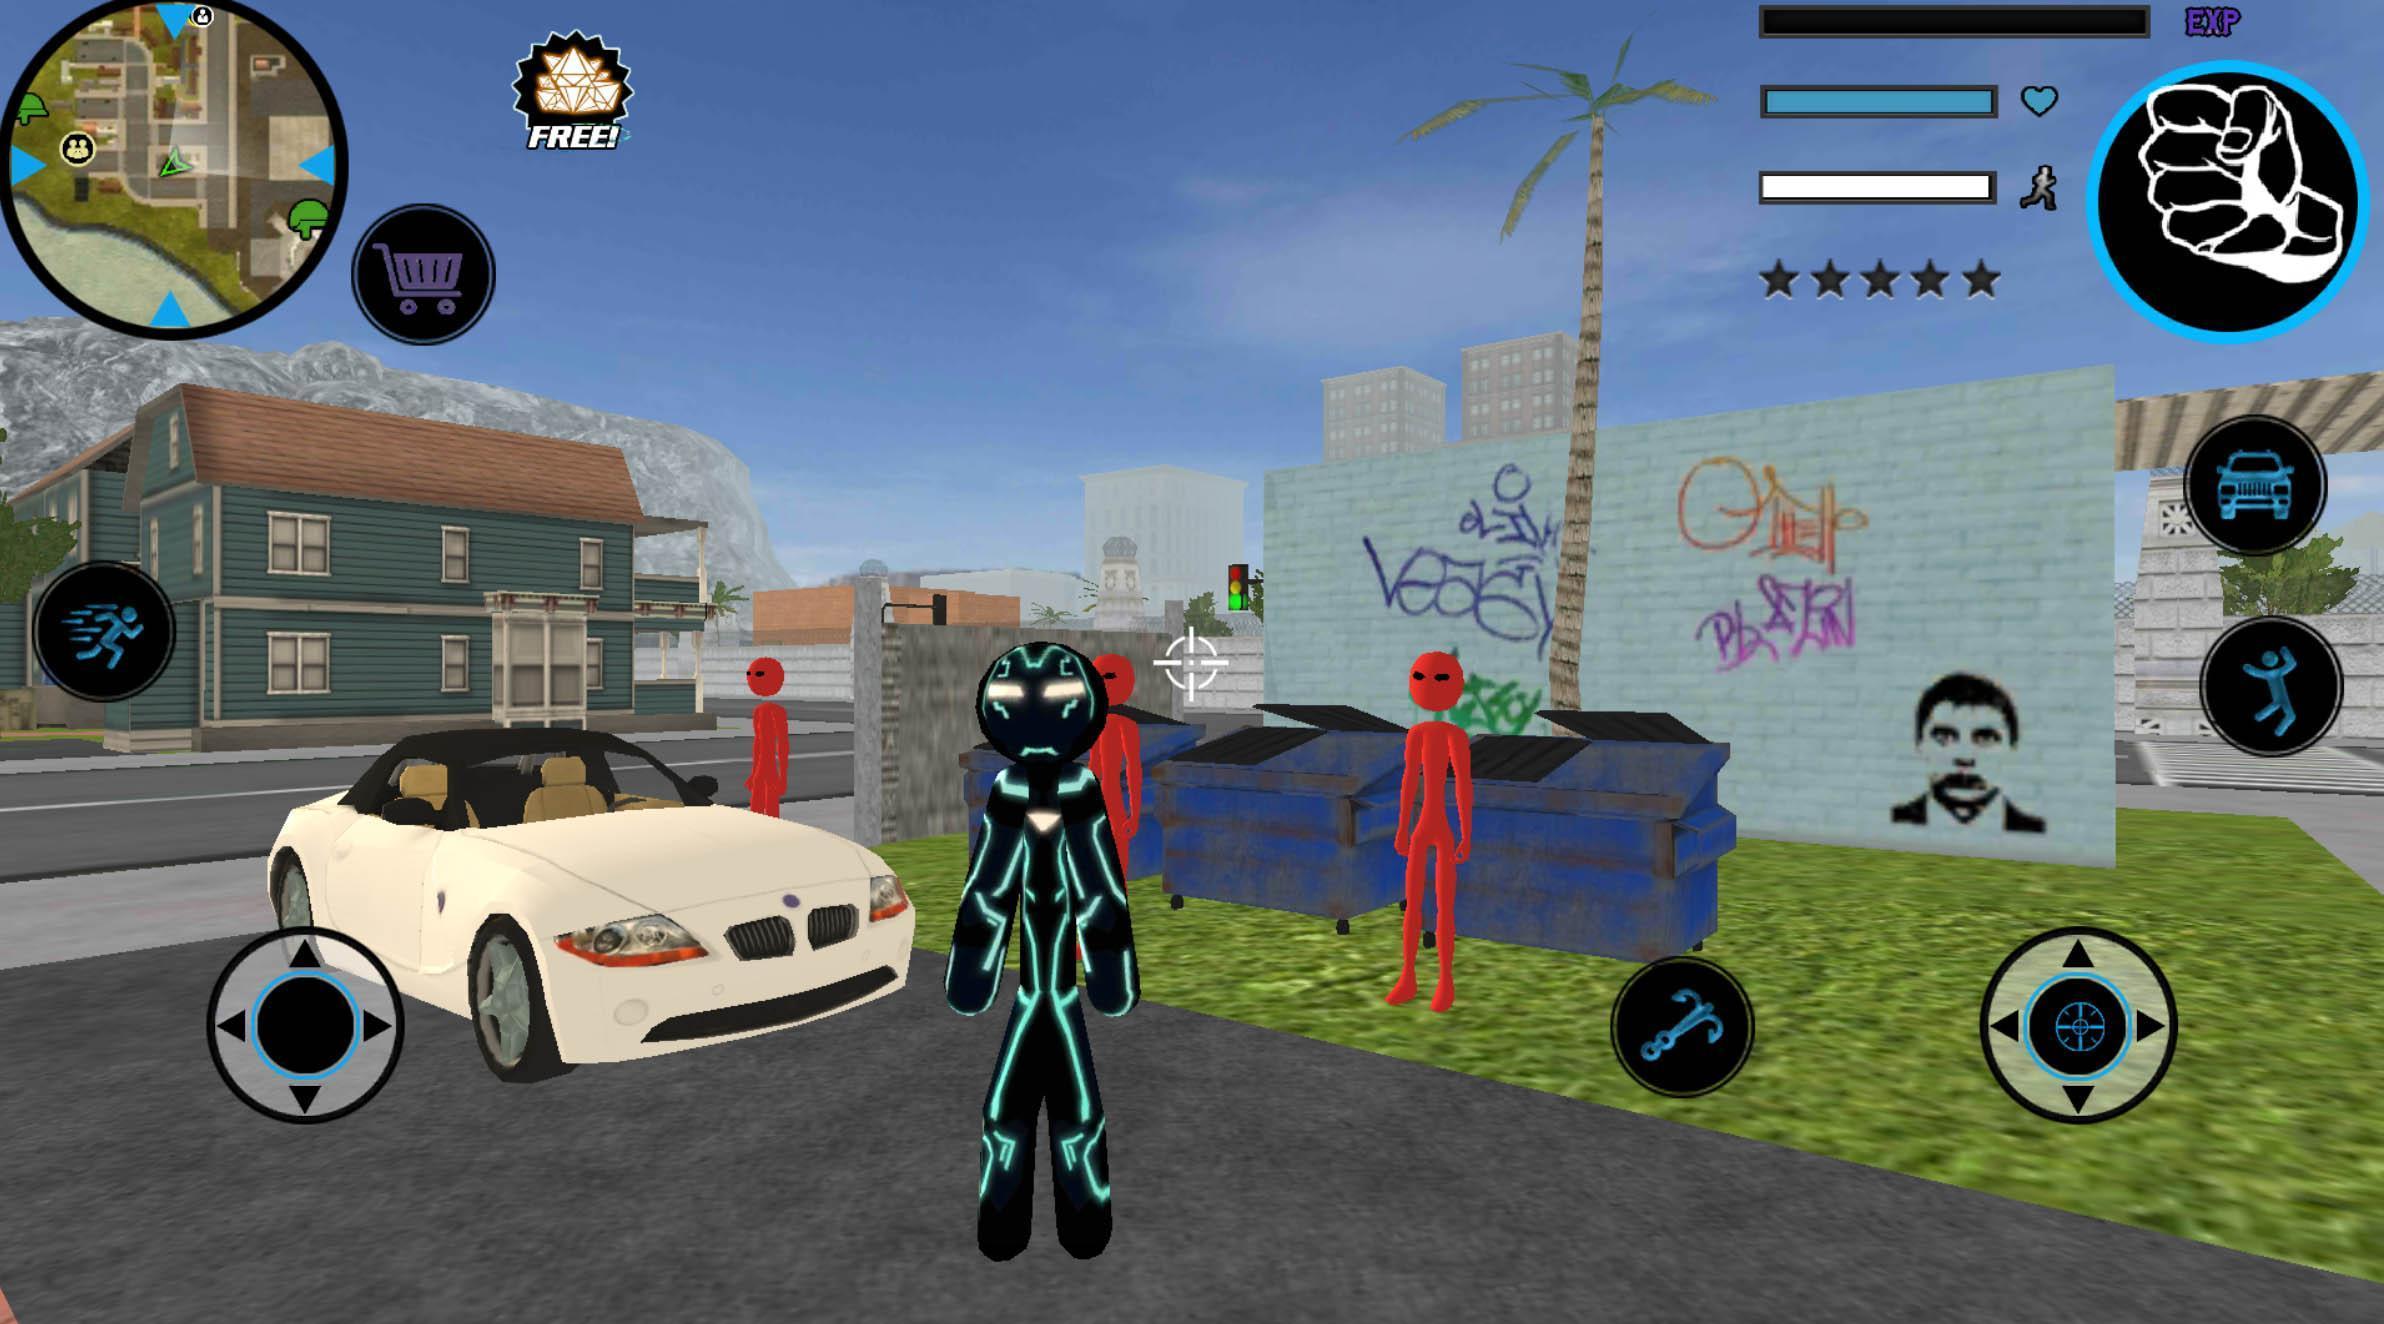 Neon Iron Stickman Rope Hero City Gangstar Mafia 1.6 Screenshot 2